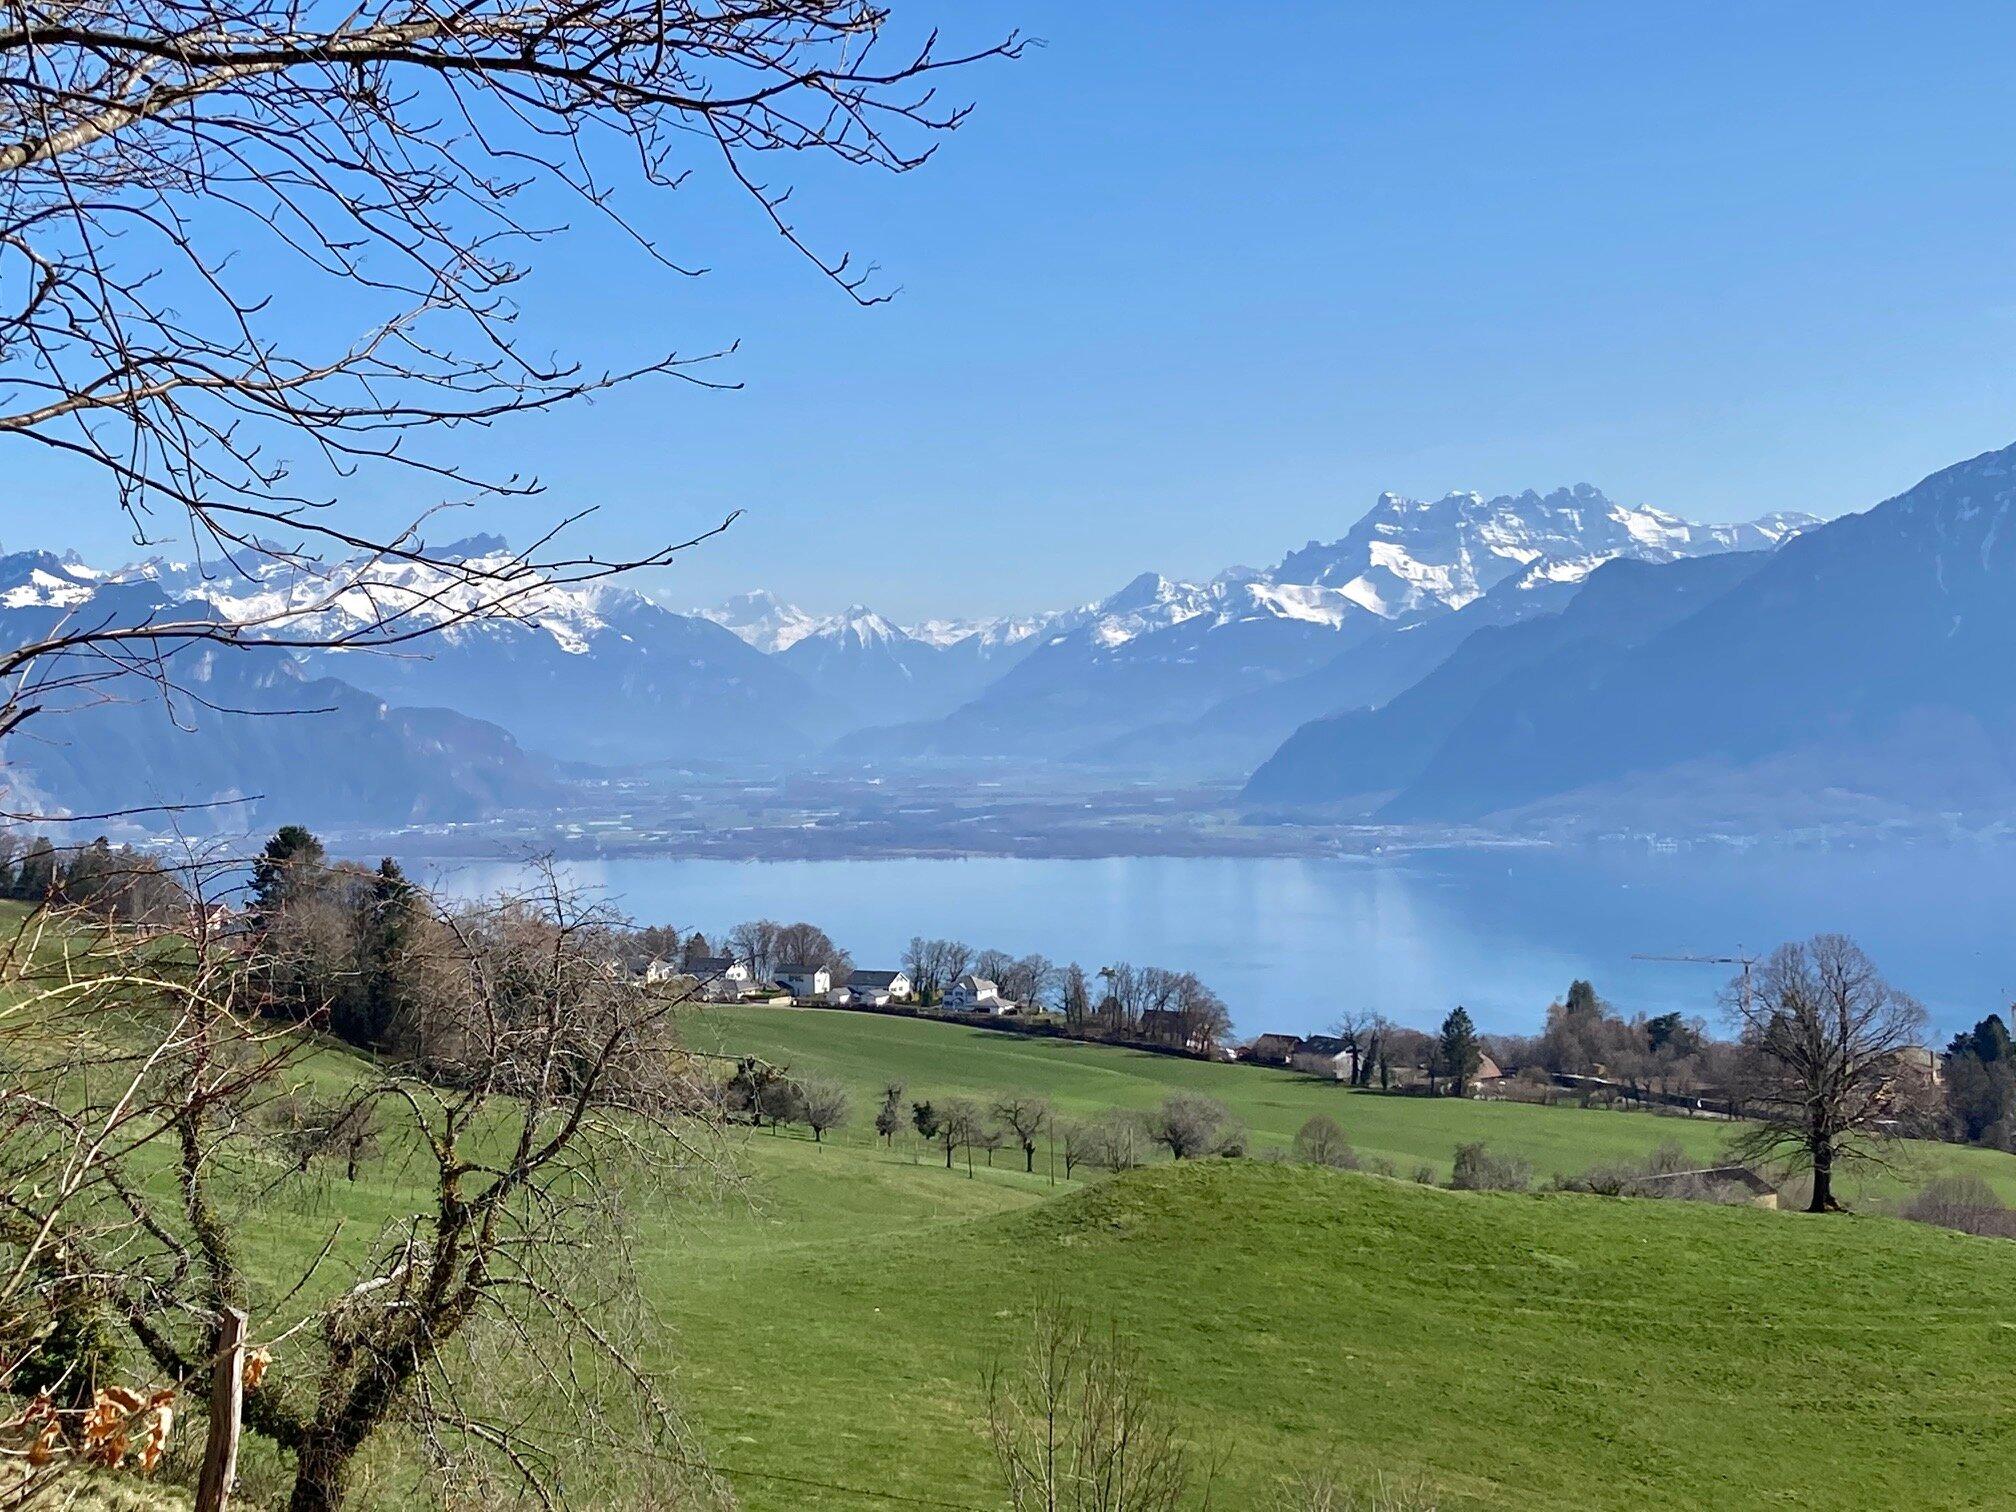 Rizzli-Alp oberhalb des Chalet Barbara